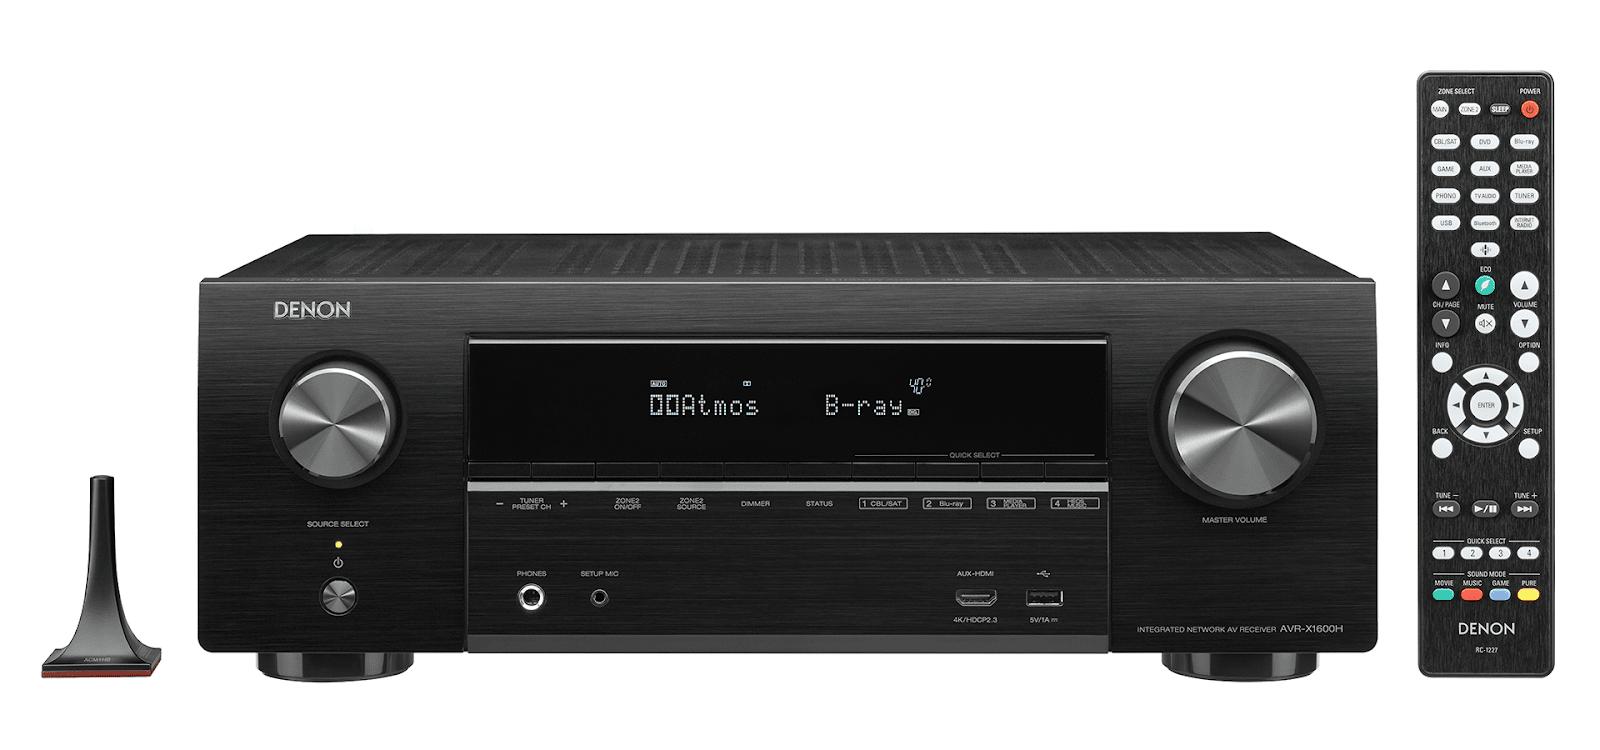 Amply Denon X1600H + Bộ Loa Polk Audio A5 rất sang trọng - 2